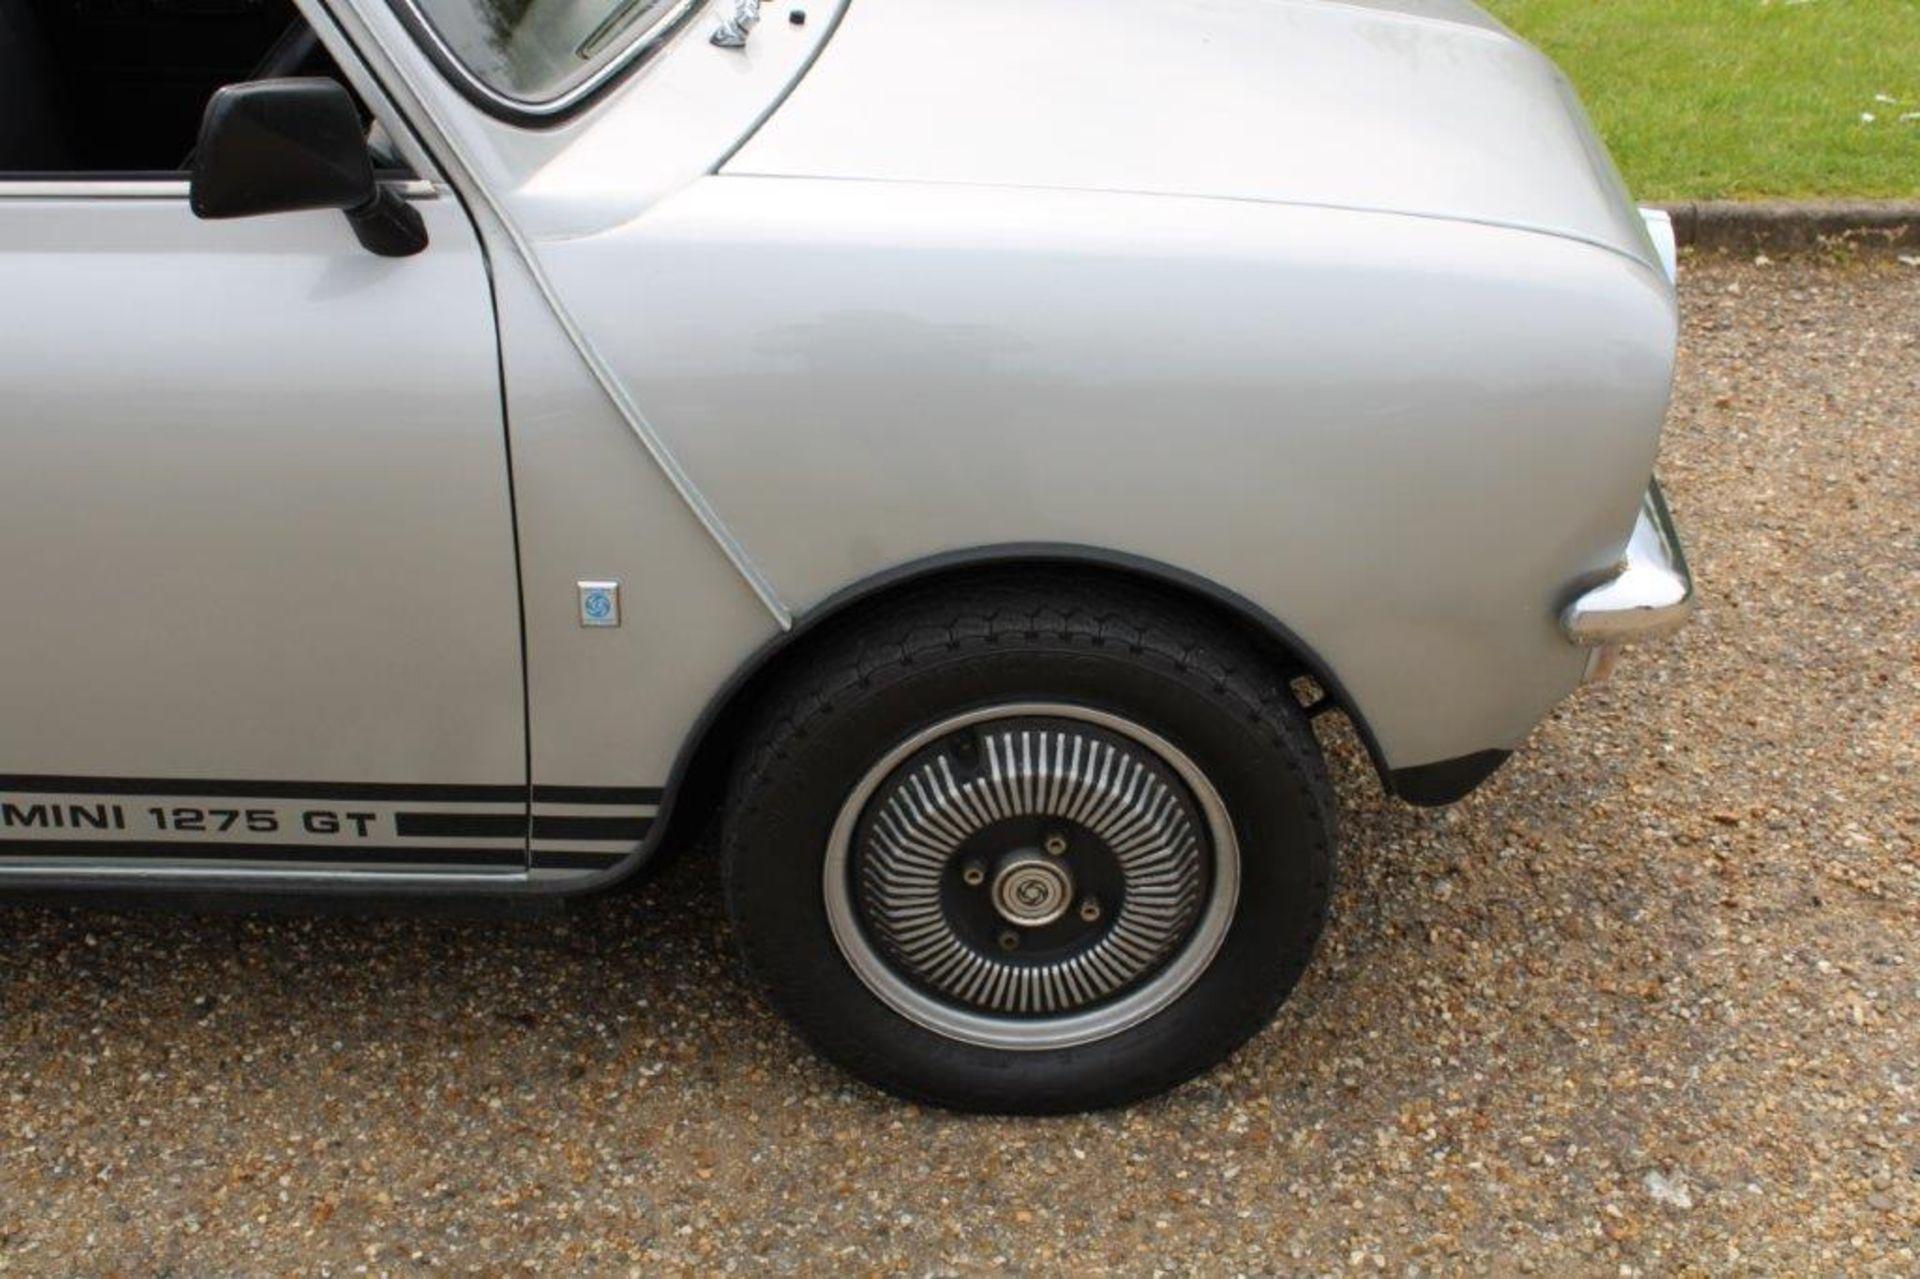 1980 Austin Morris Mini 1275 GT - Image 7 of 28